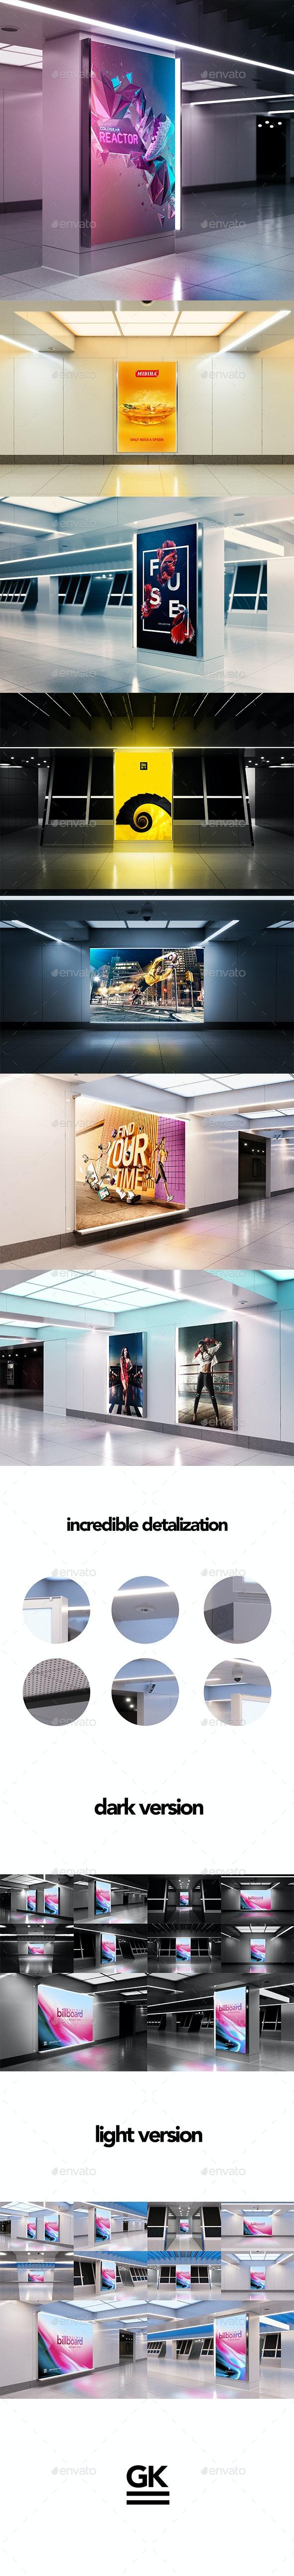 Billboard Mock-up - Ad Station Series - Posters Print